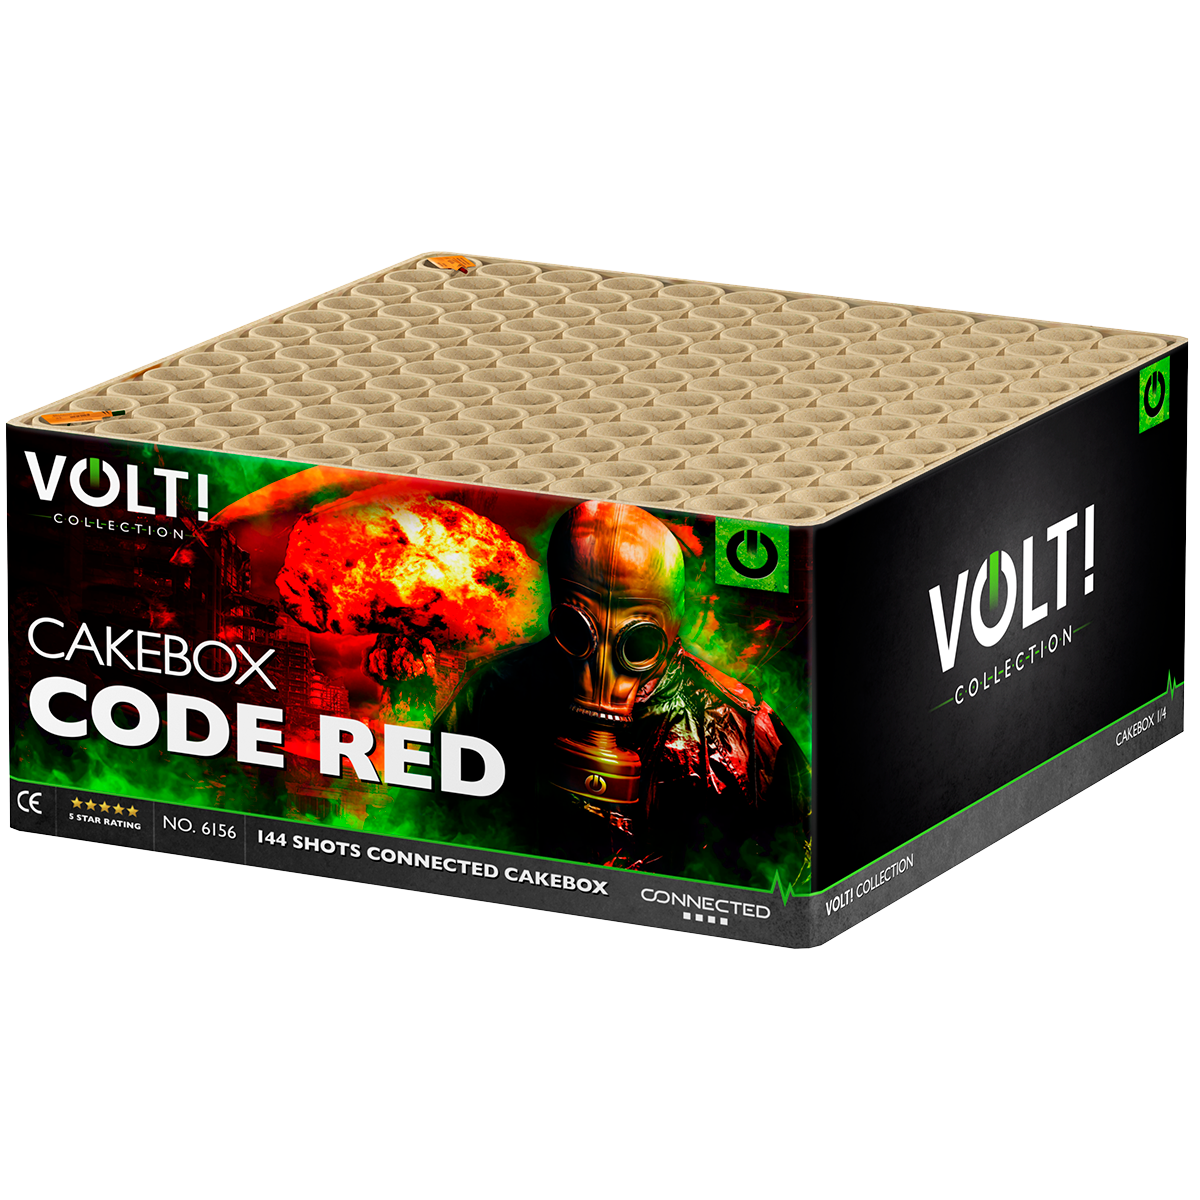 Code Red [karton]